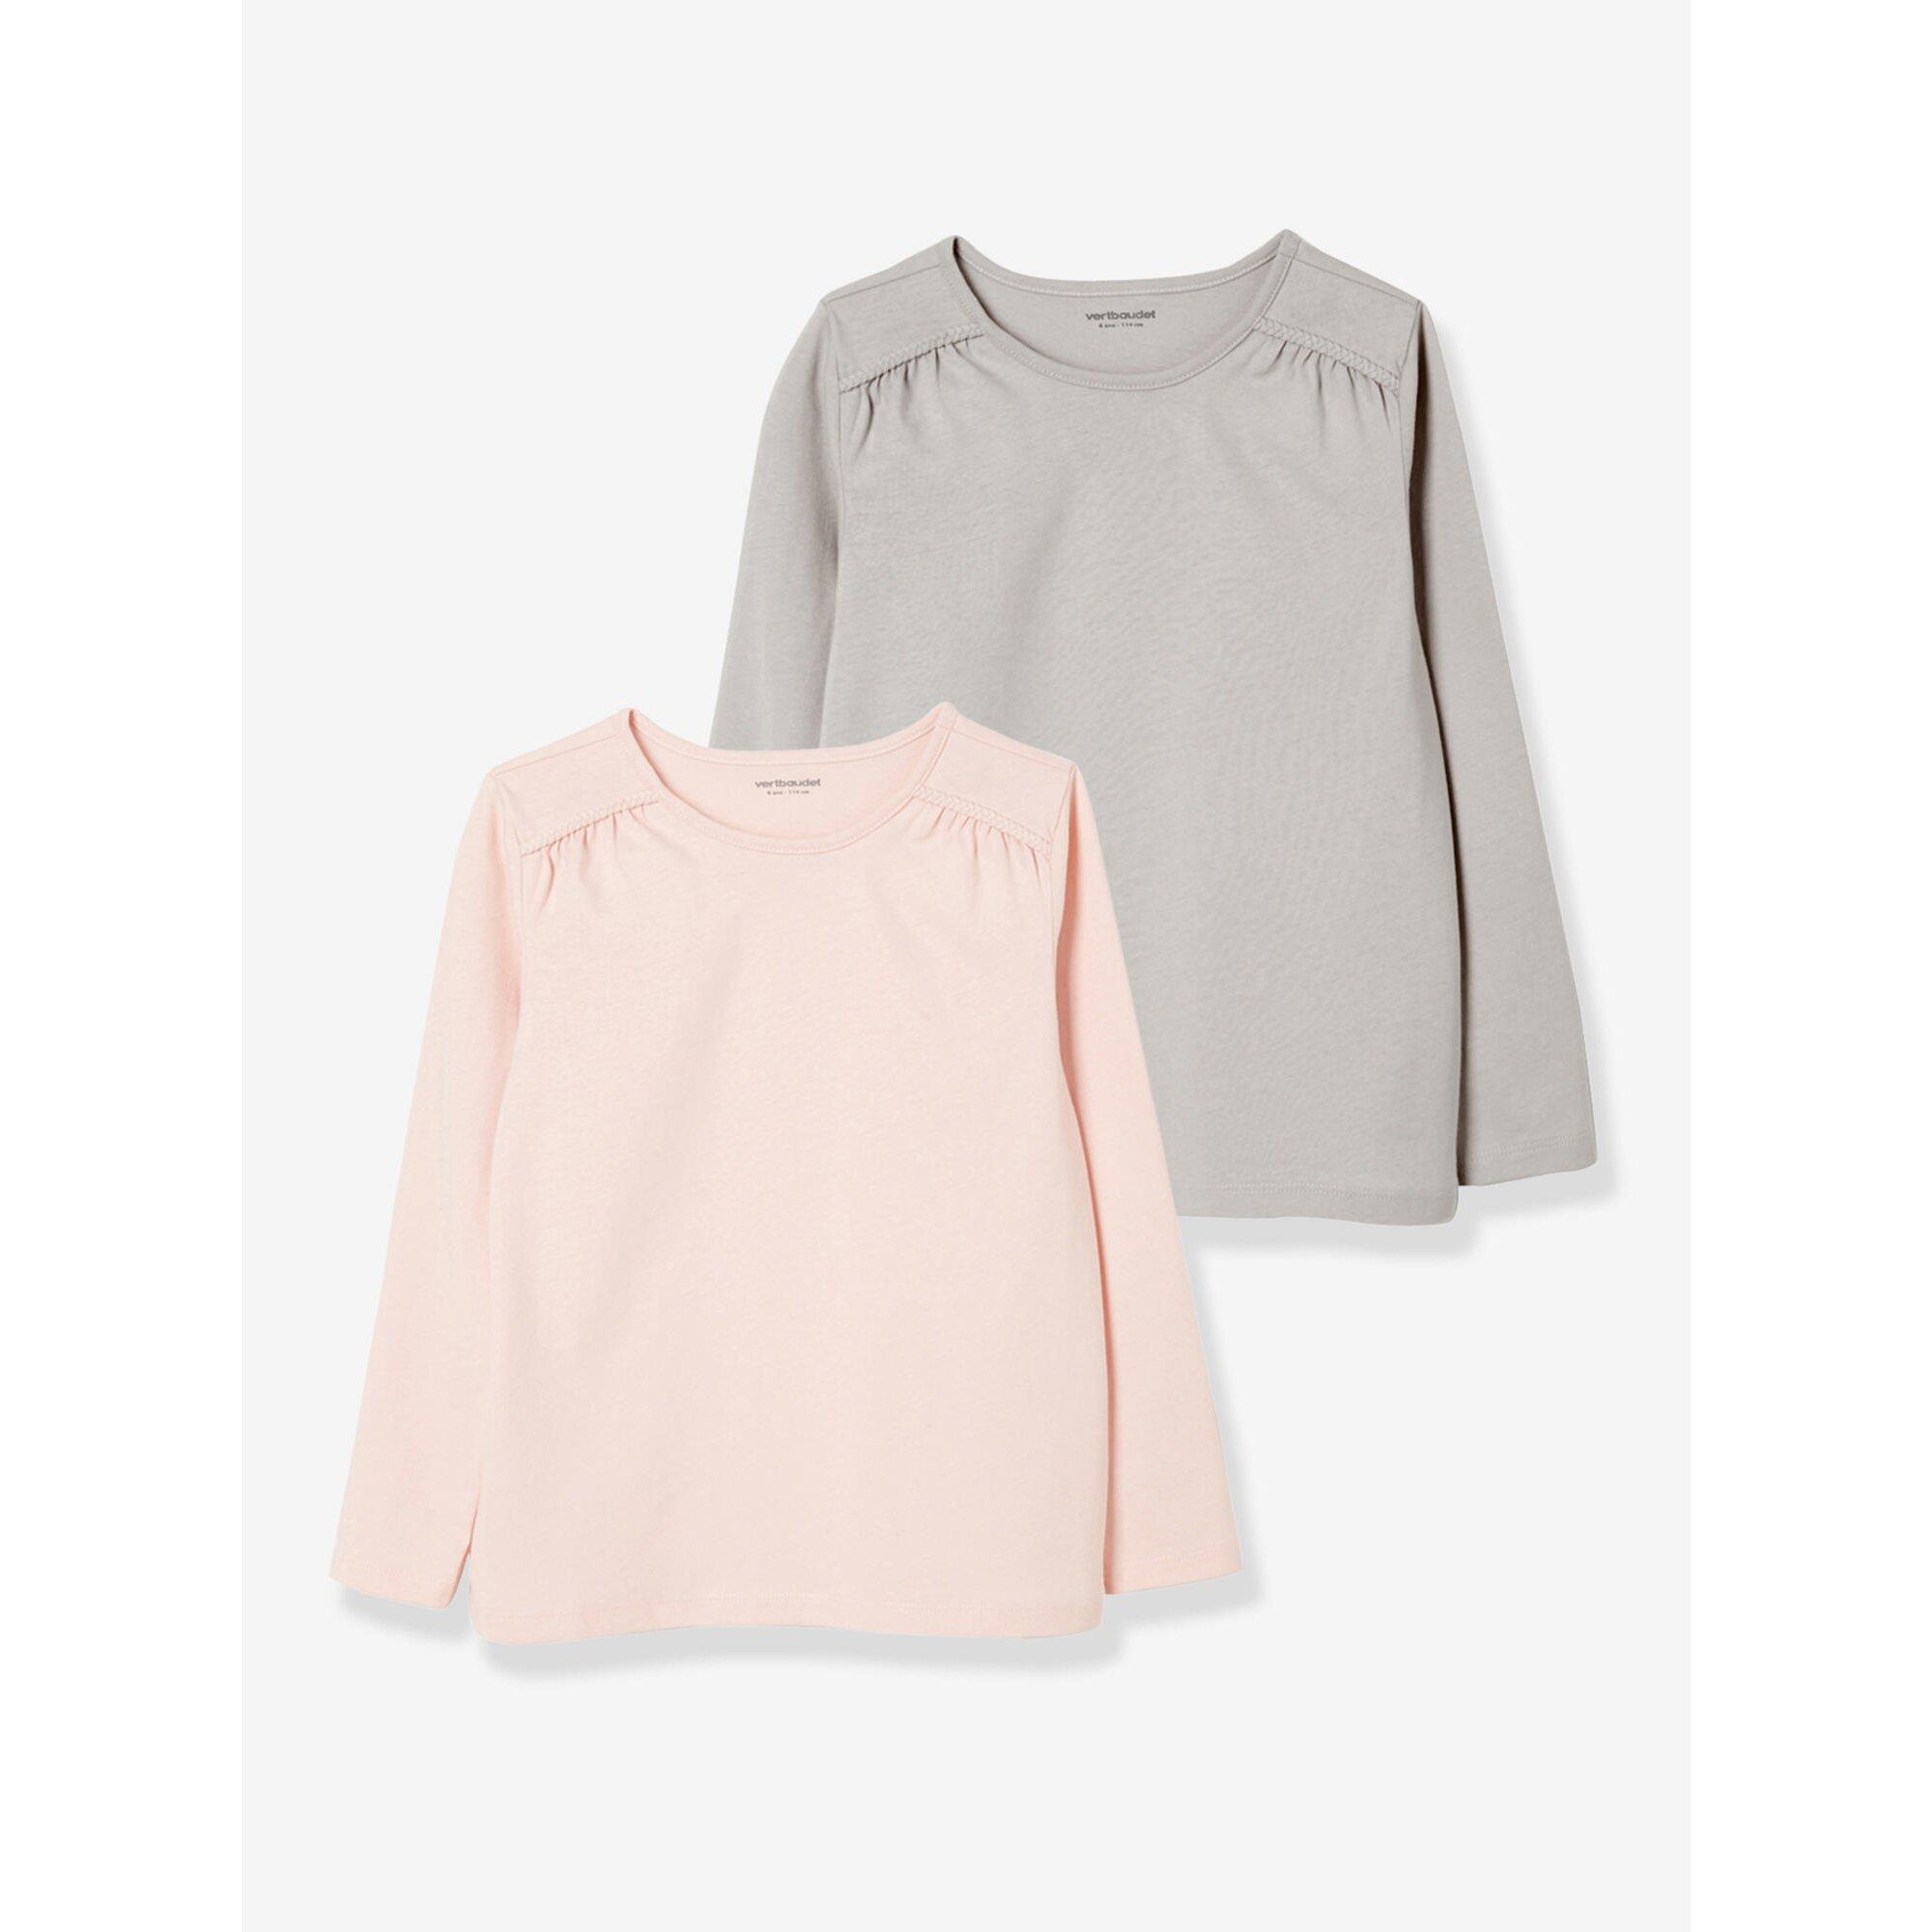 vertbaudet-2er-pack-langarm-shirts-fur-madchen-uni, 10.99 EUR @ babywalz-de